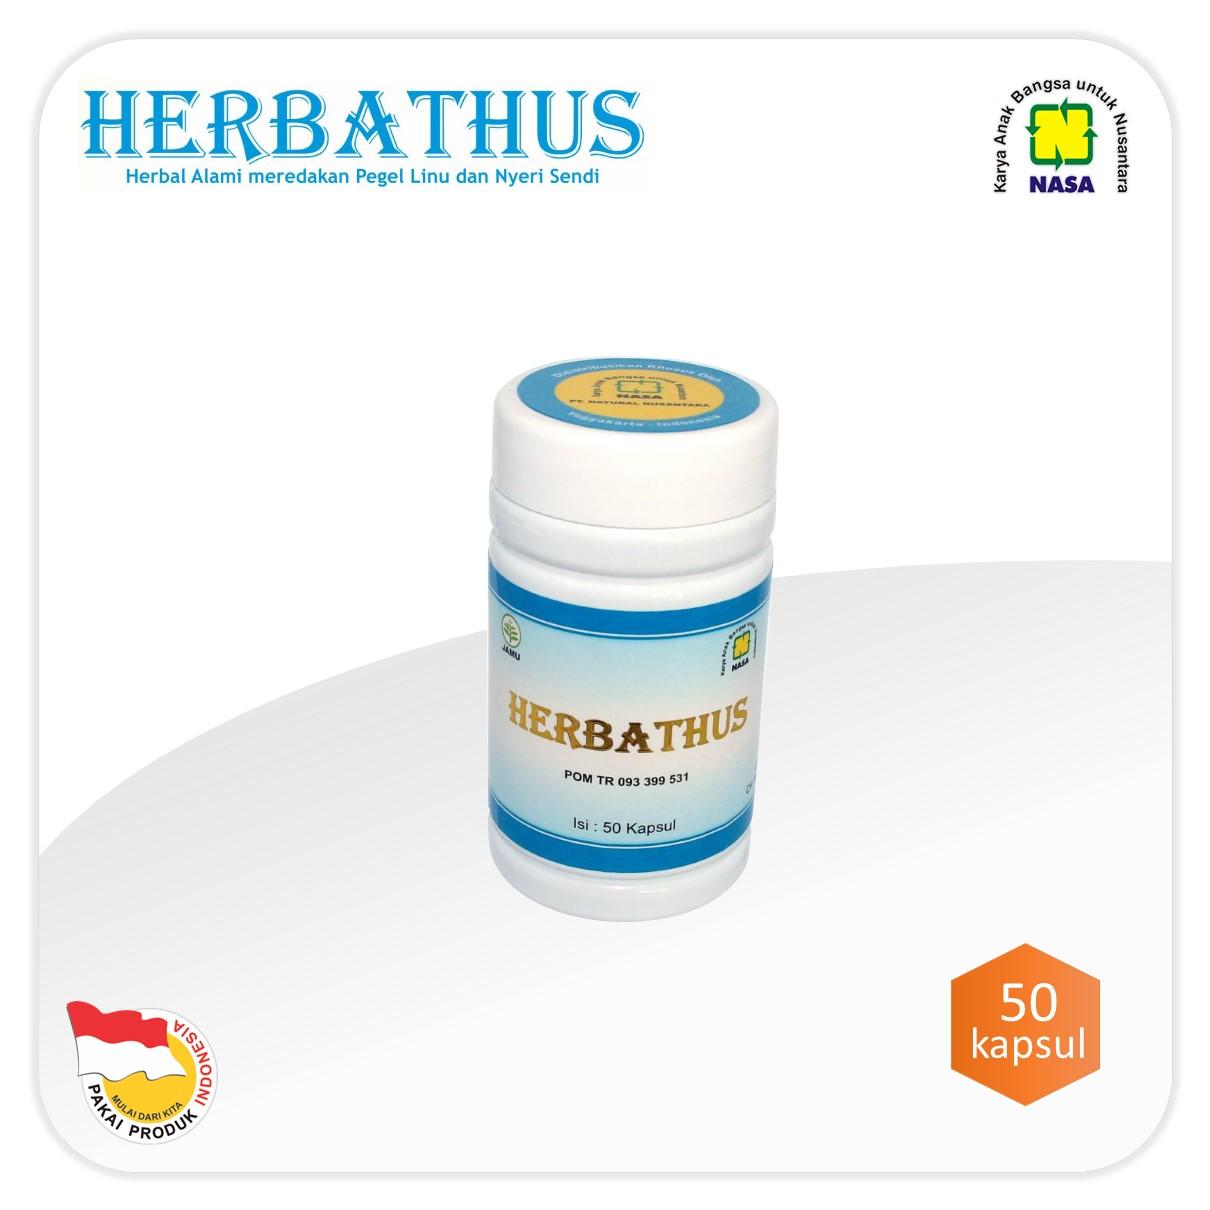 Herbathus Nasa